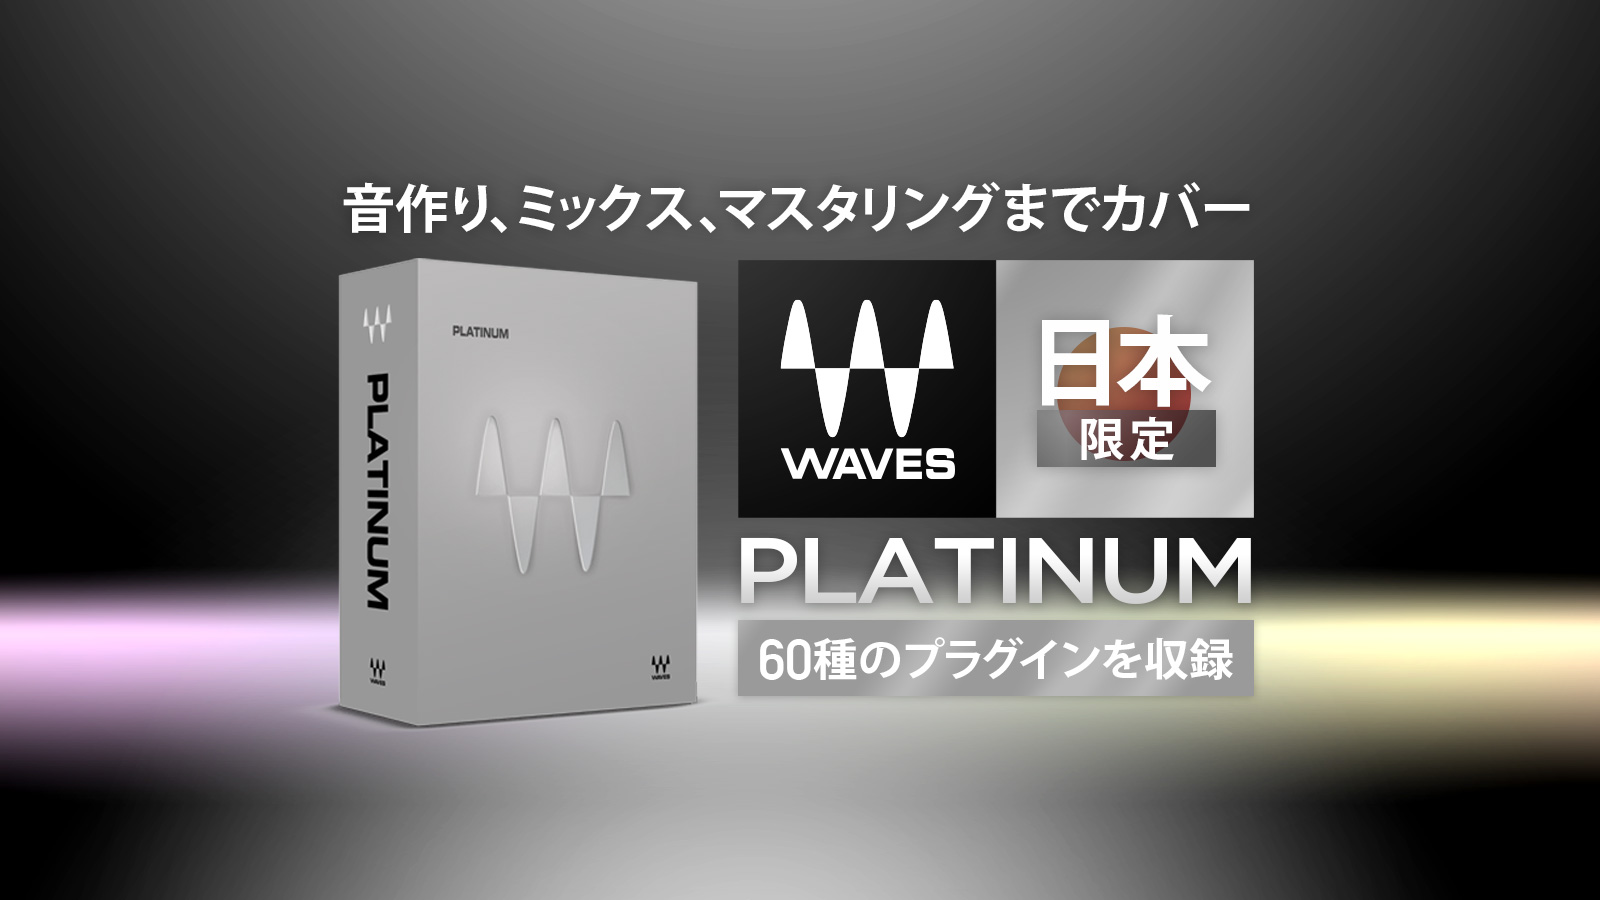 Waves Platinum 日本限定プロモーション